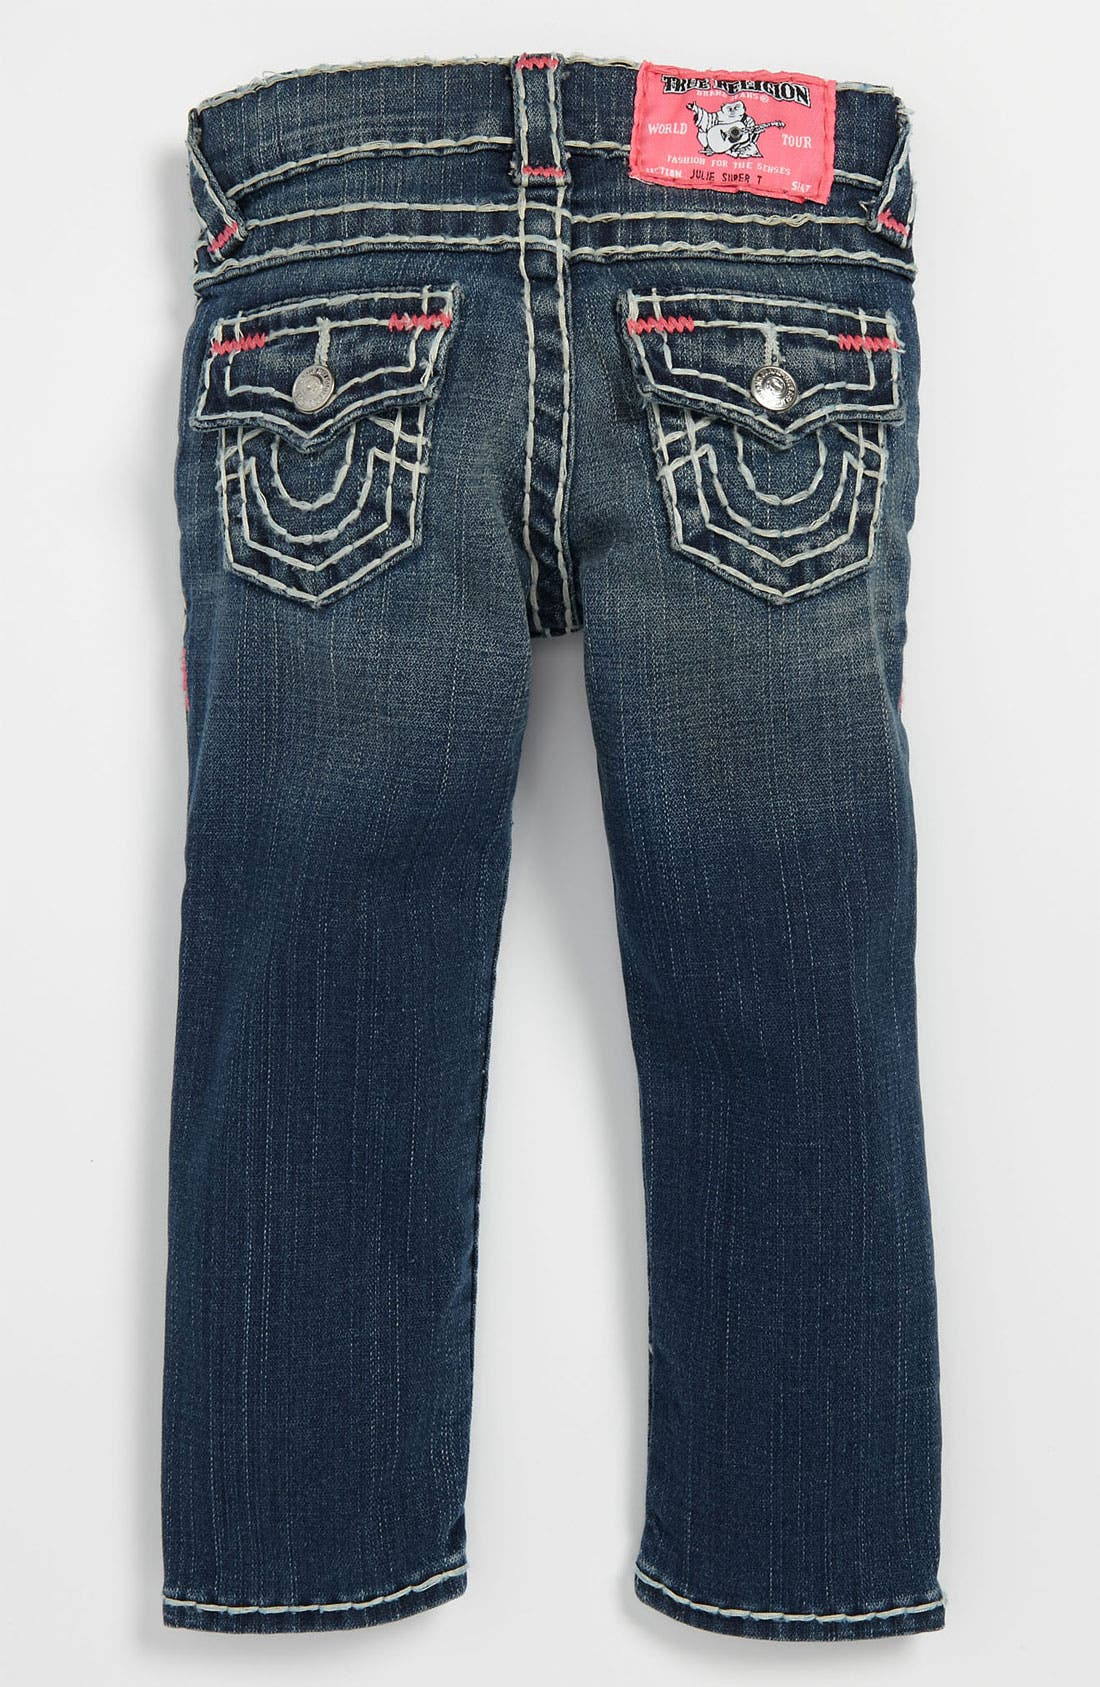 Main Image - True Religion Brand Jeans 'Julie' Skinny Leg Jeans (Toddler)